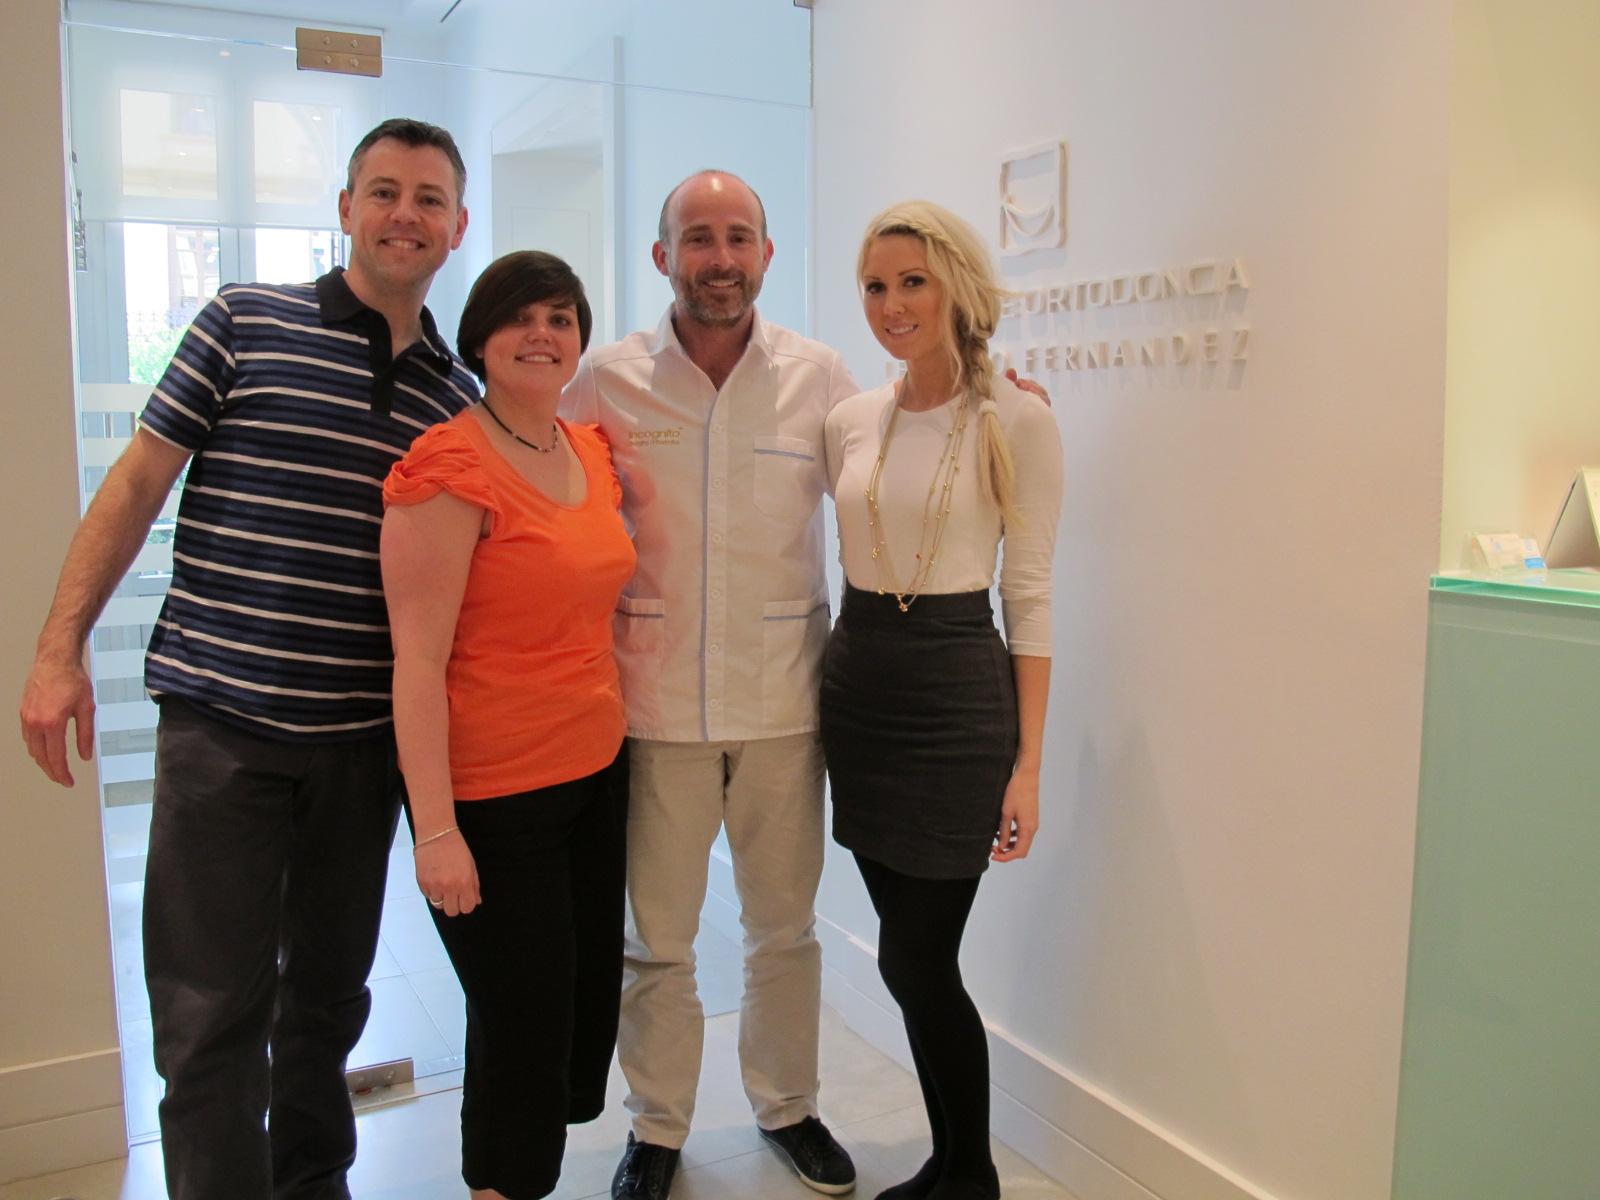 Eddie Harris, Lucy Evans, Dr. Fernández y Emma Rodway.